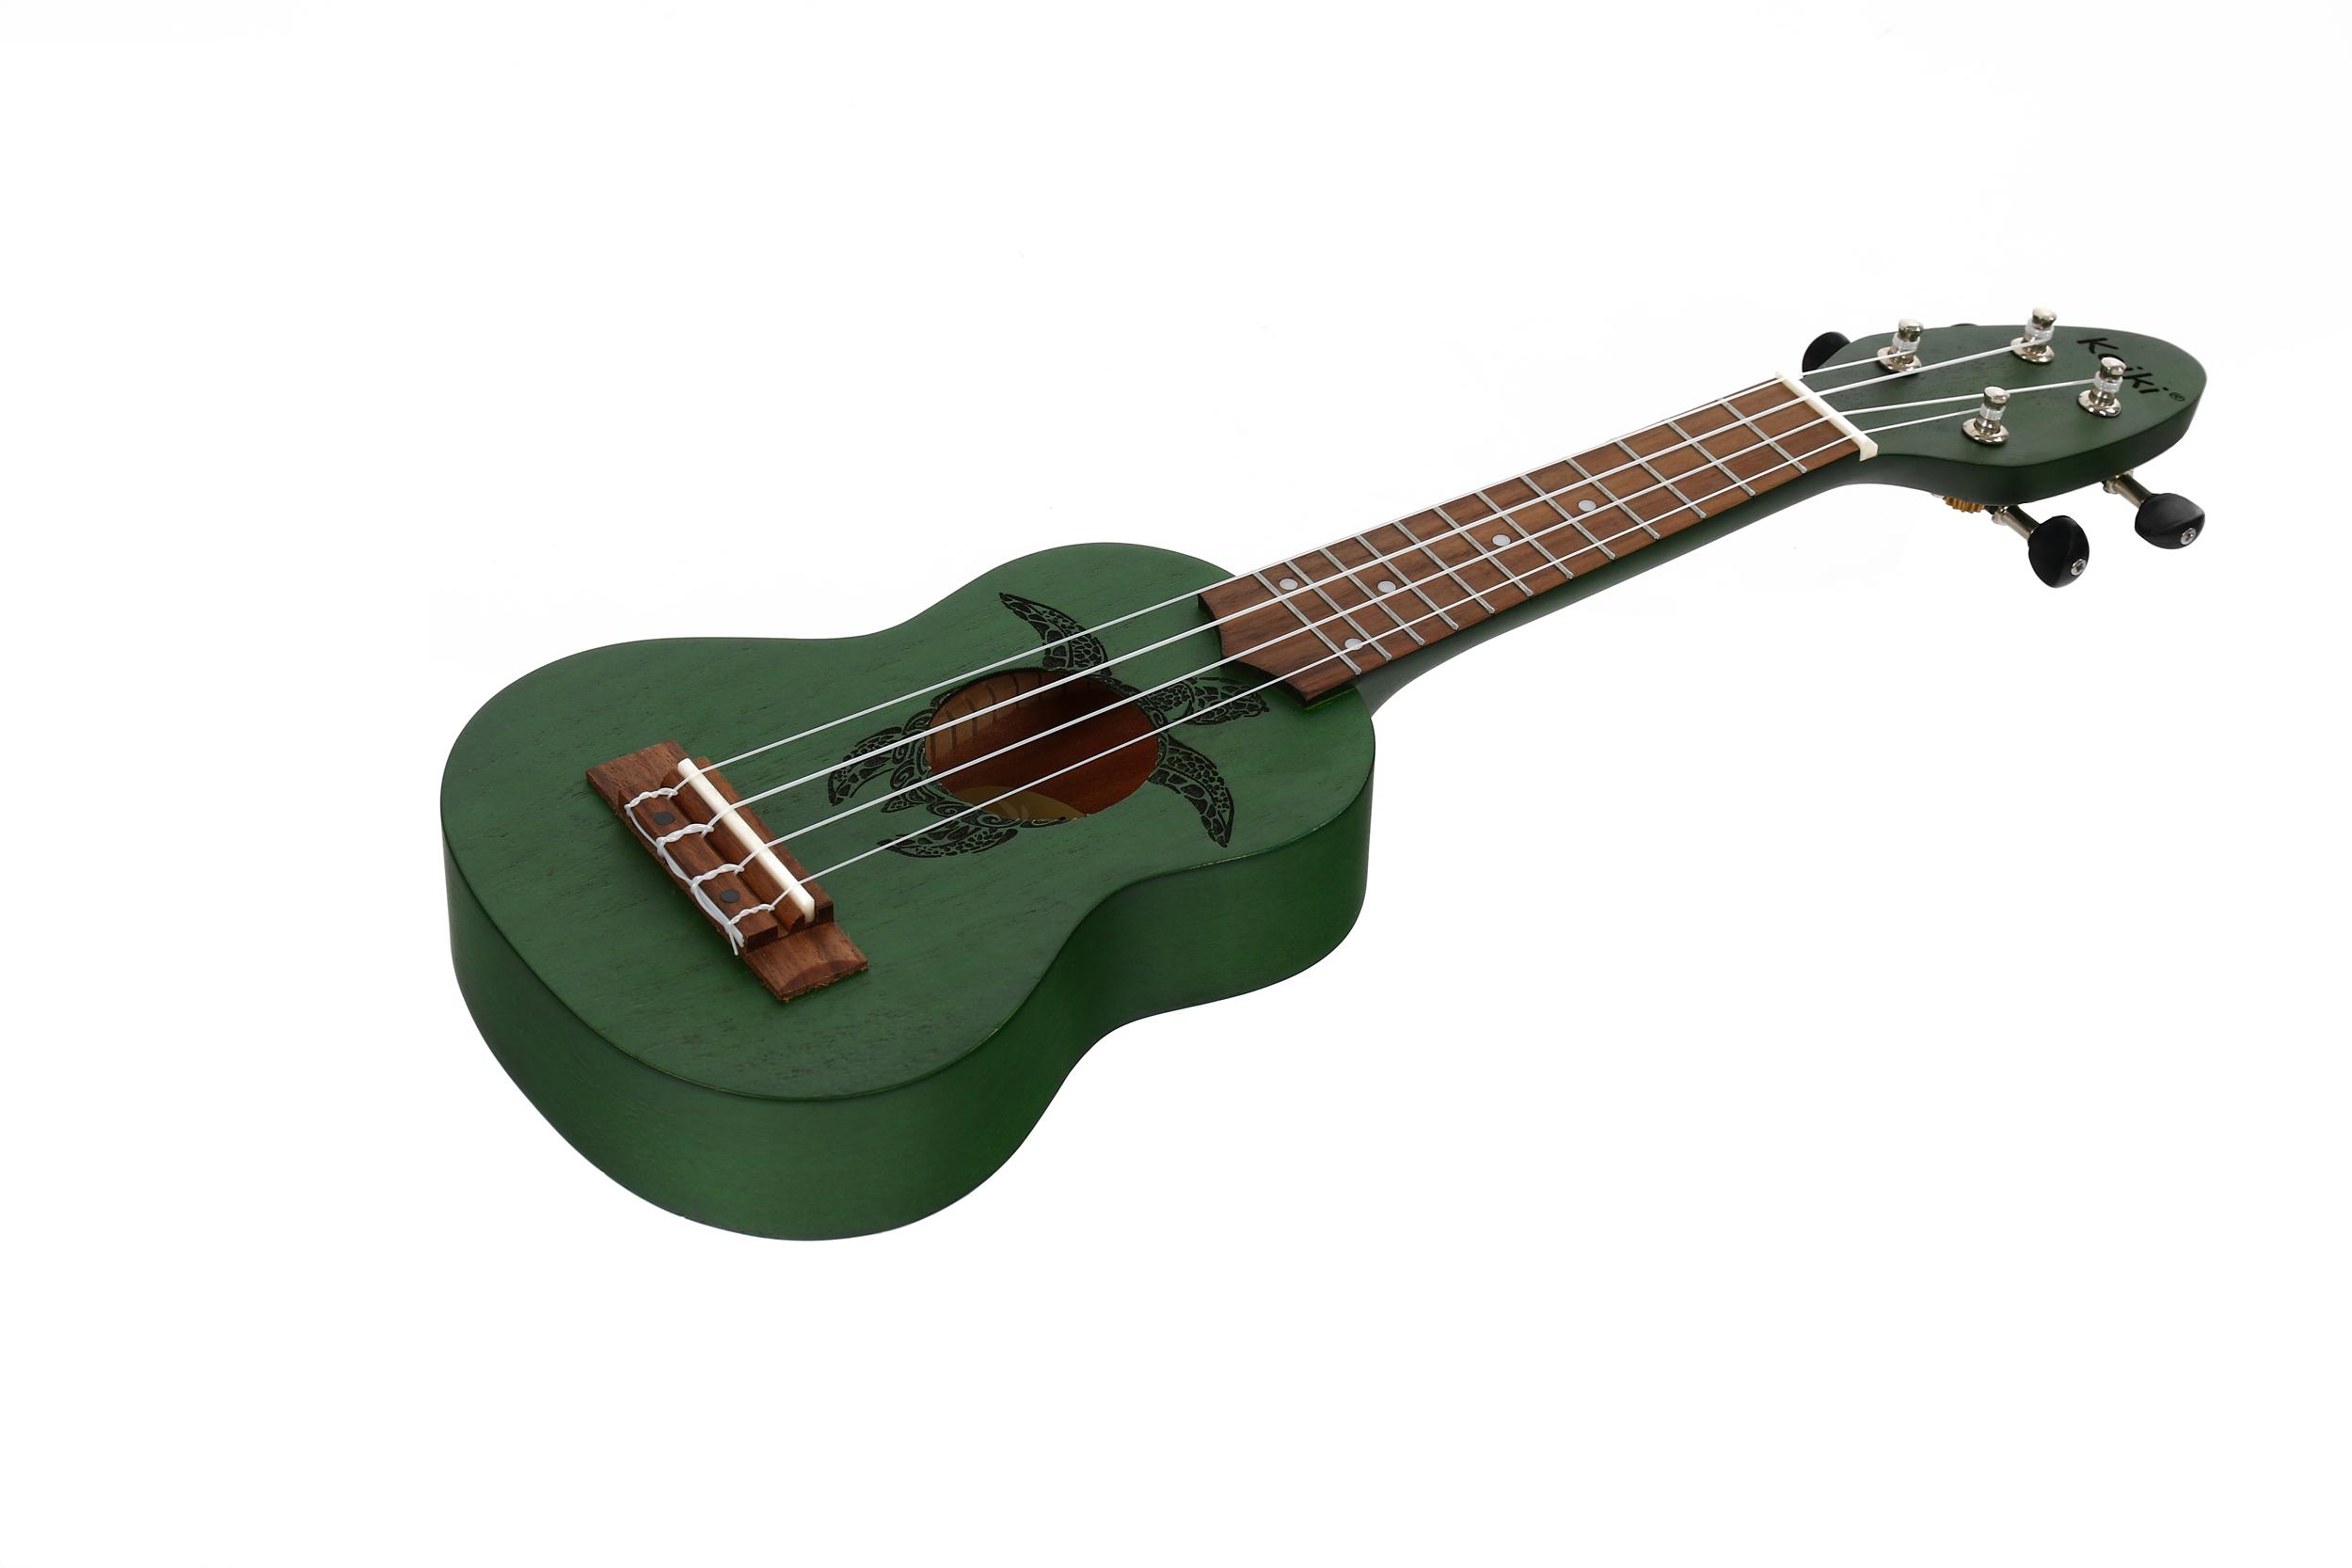 Ortega_Keiki K1-GR_Ukulelen_8_Guitar Shop Corda